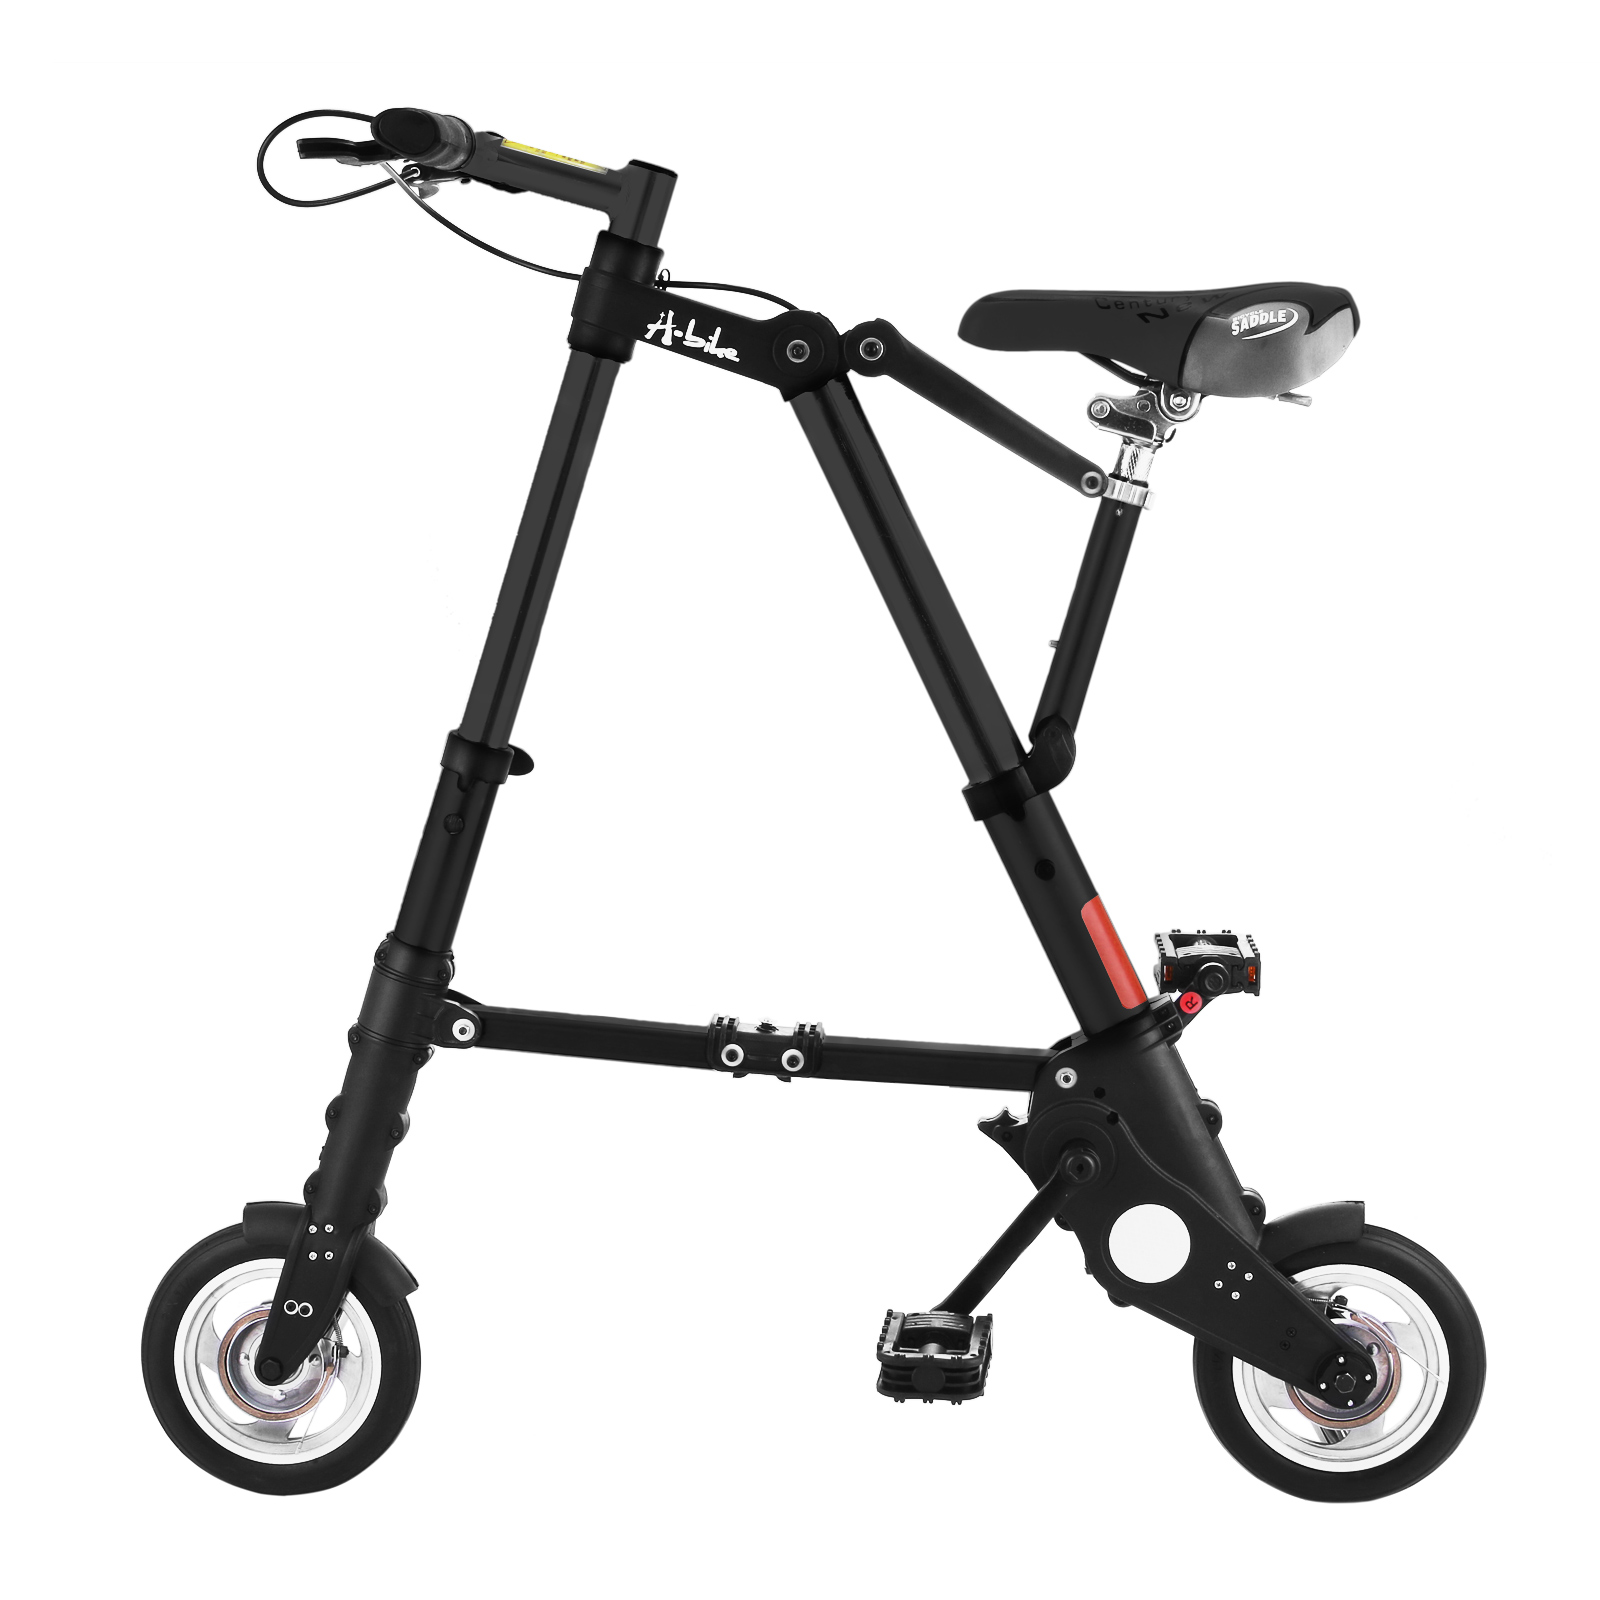 Vevor Black Foldable Mini Bike 8 Inch Folding Bike Aluminum